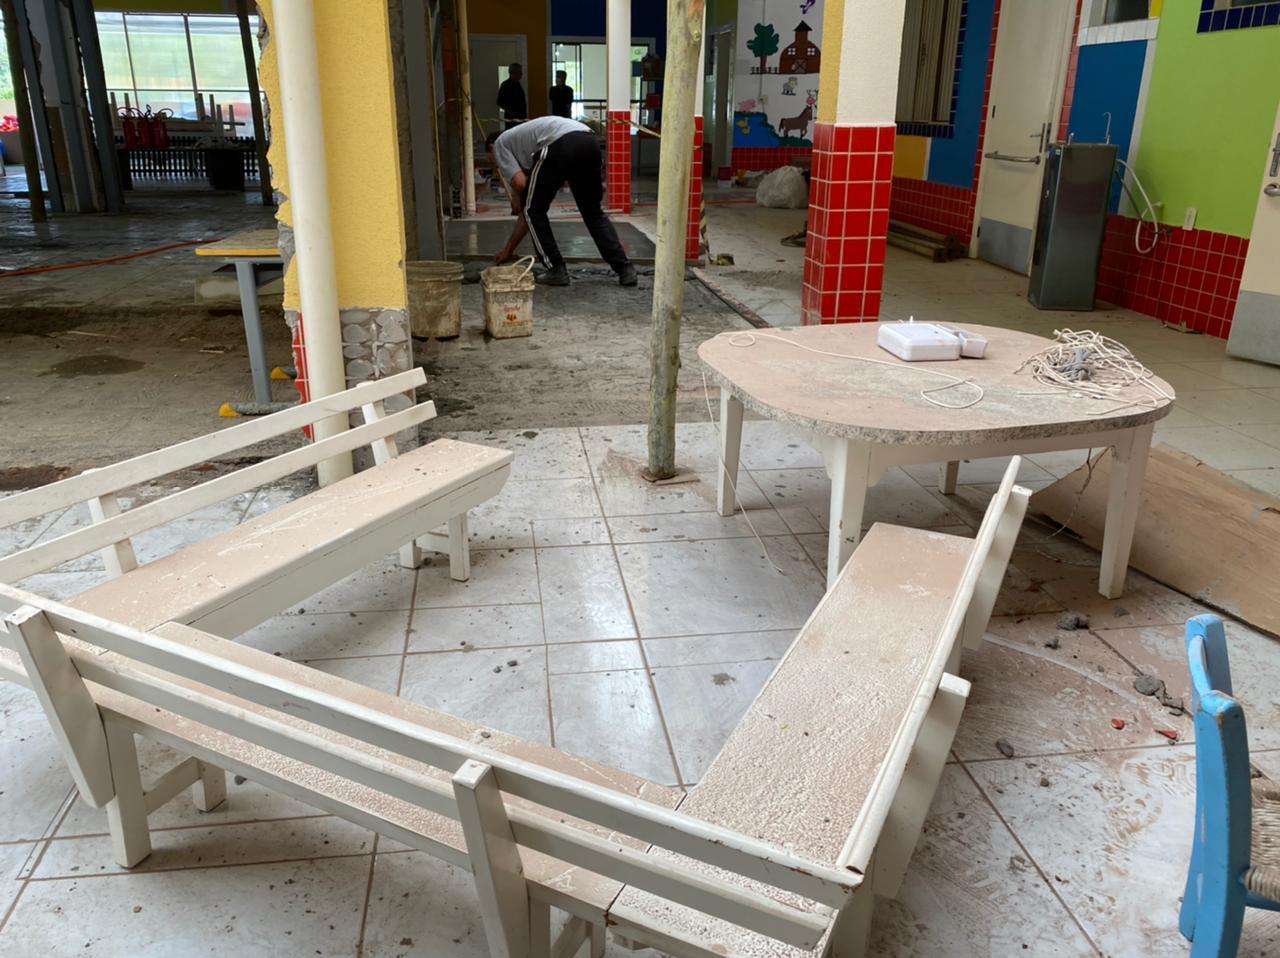 Além da reforma estrutural, a creche também receberá nova pintura - Willian Ricardo/ND